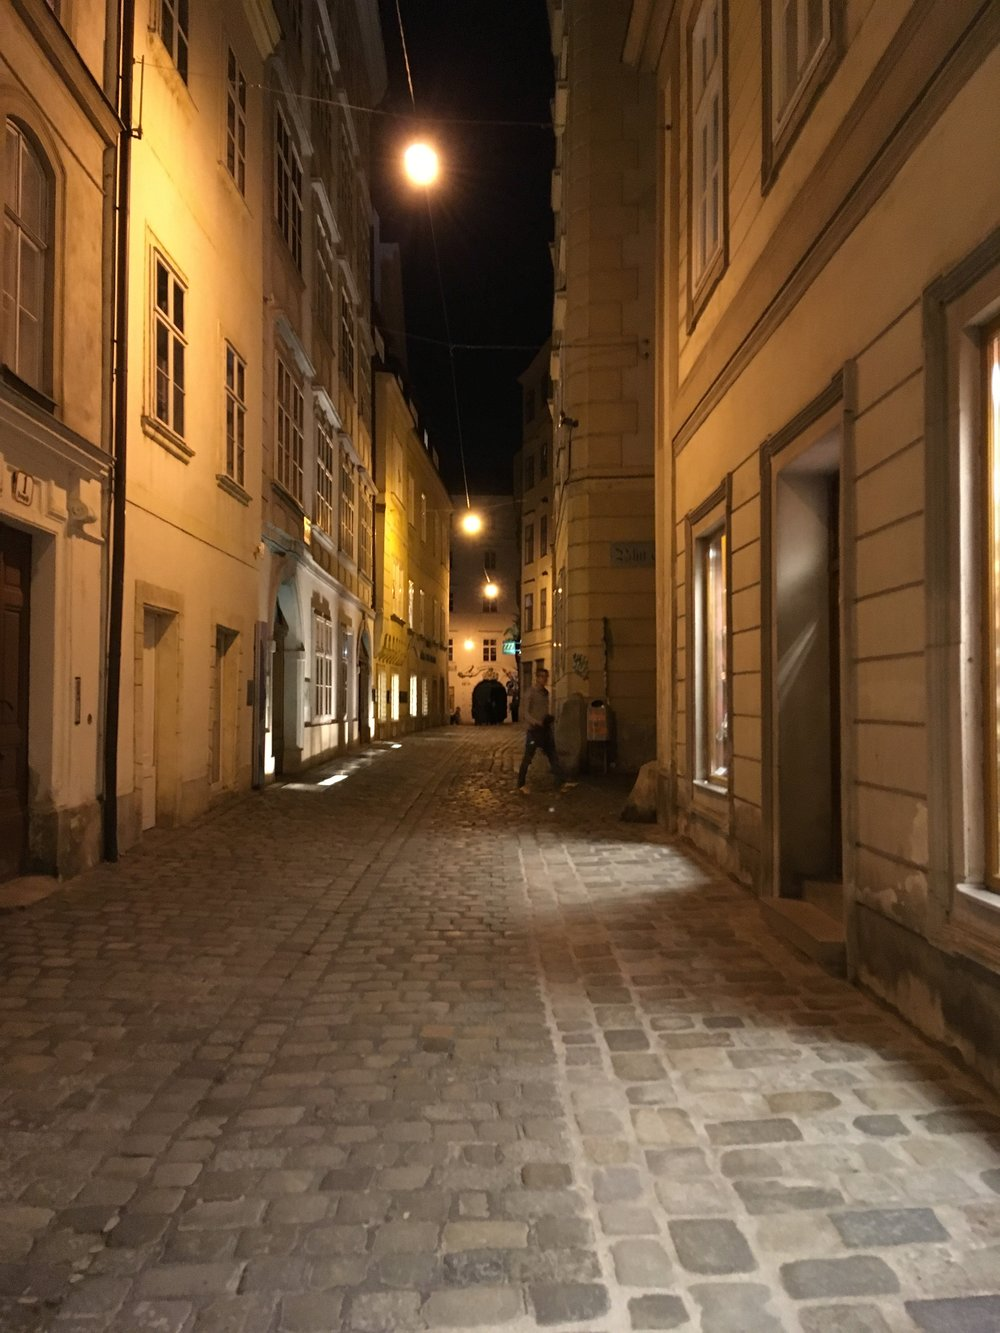 Mozart's street